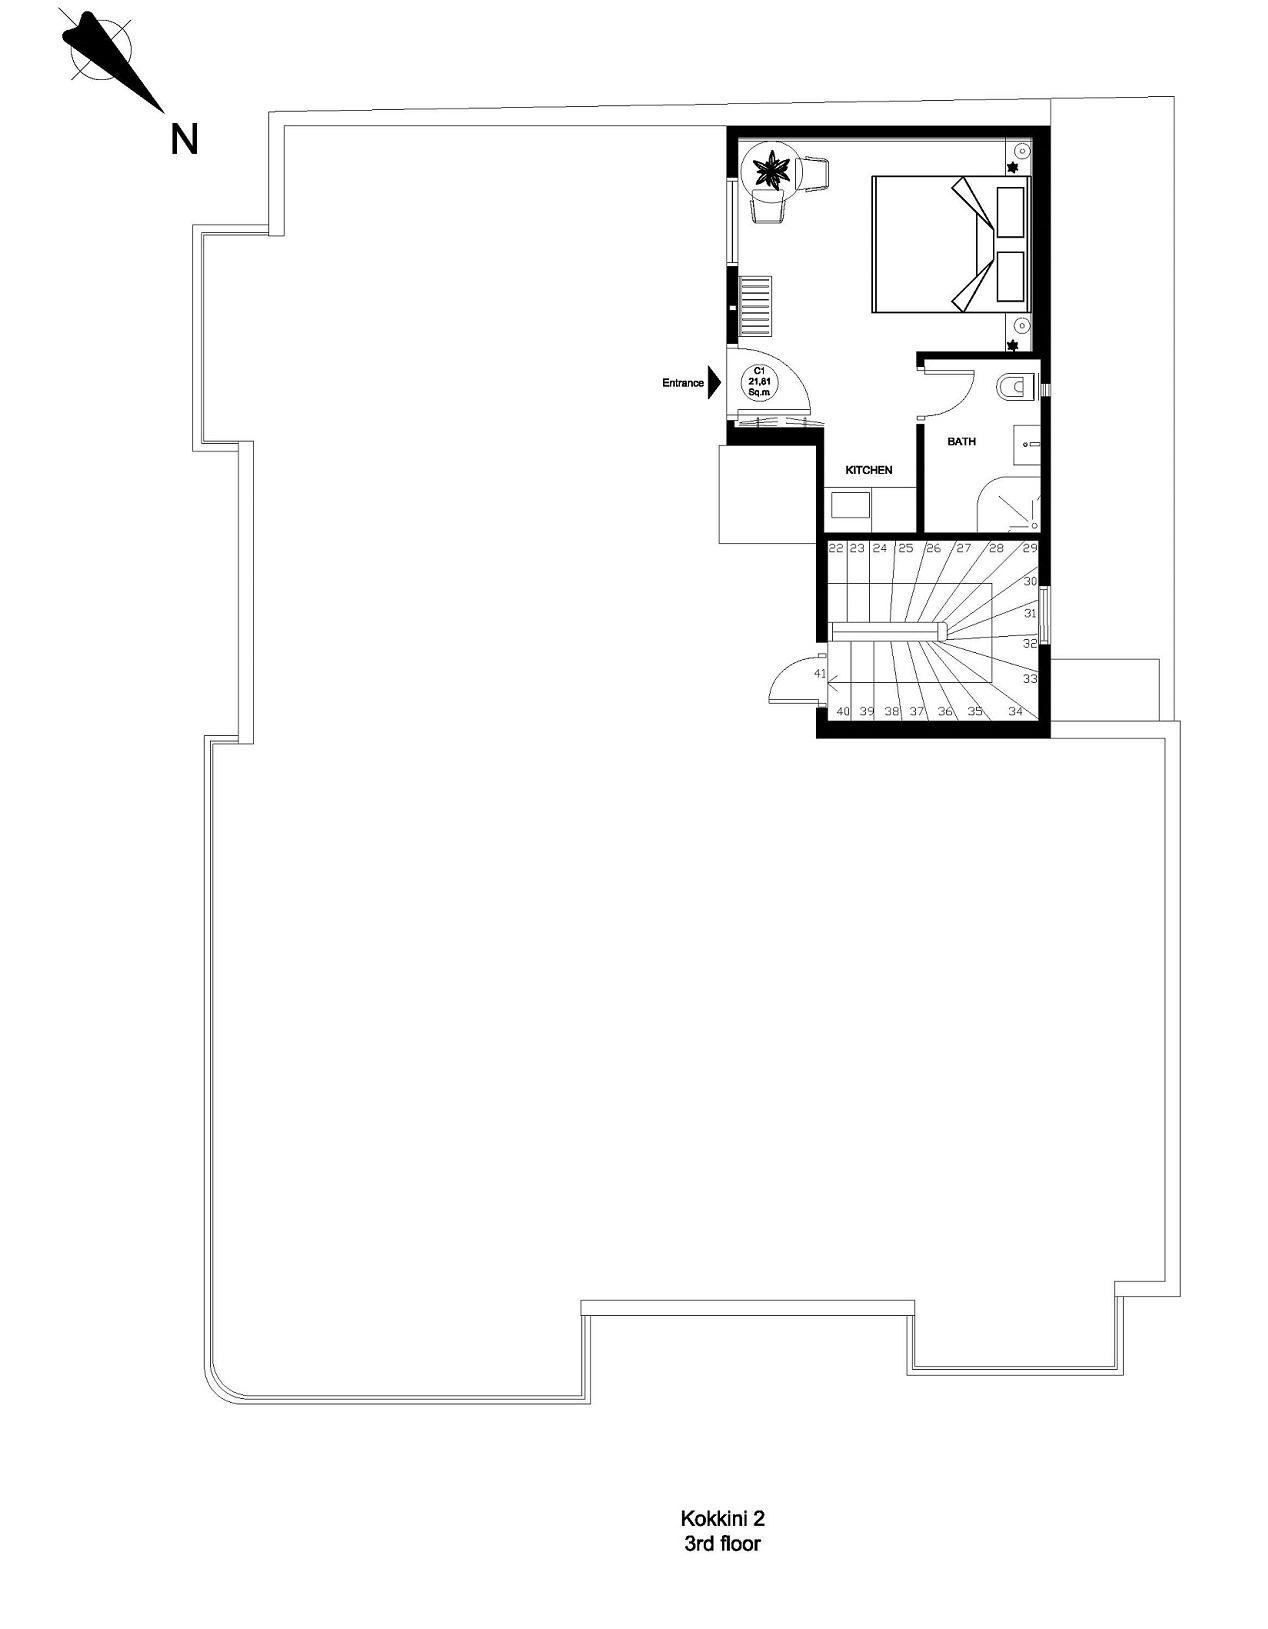 Kokkini 2 3rd floor plan